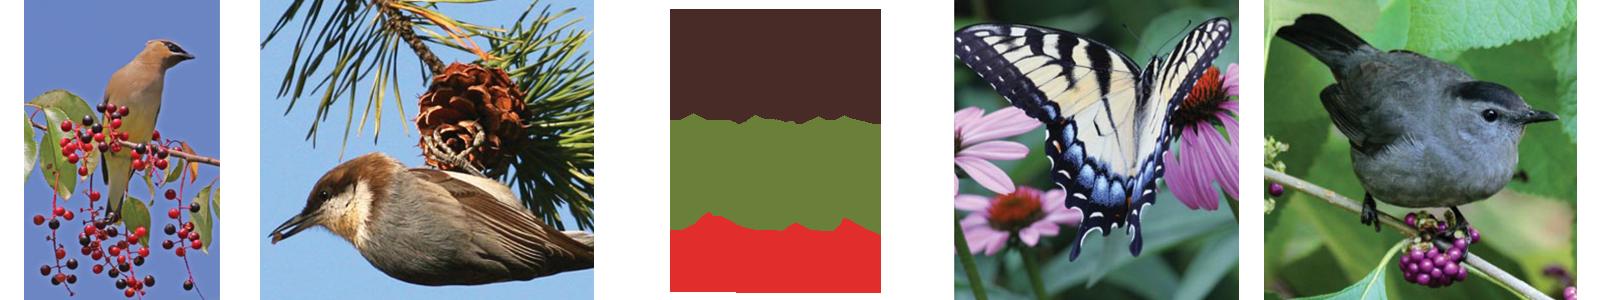 native plants - Creating Bird Friendly Communities